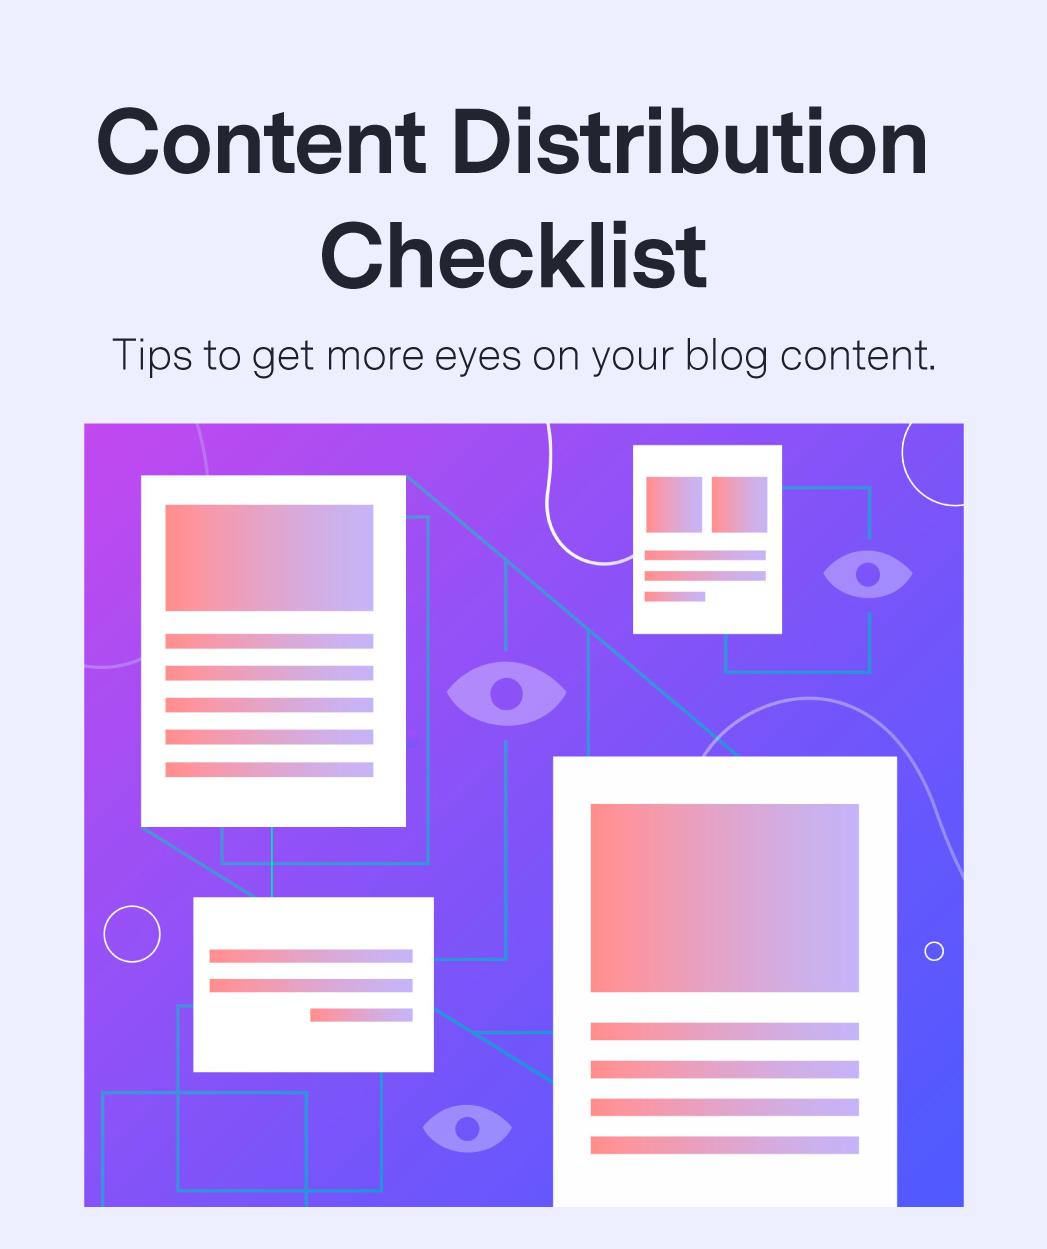 Content-Checklist-Resource-Image